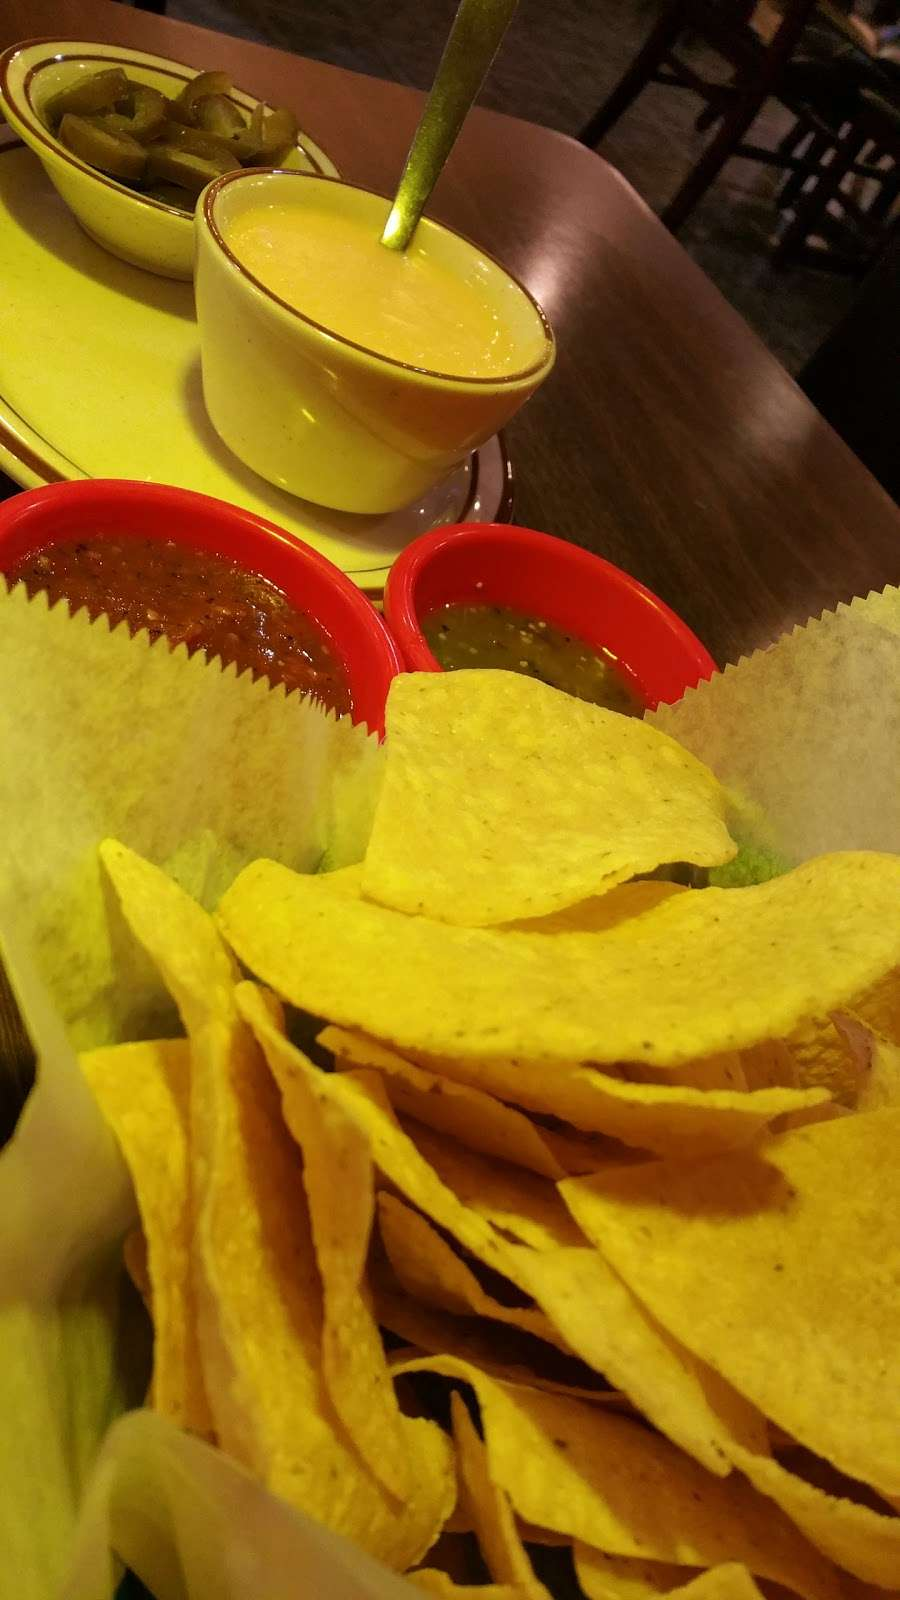 El Charro Restaurant & Cantina - restaurant    Photo 7 of 10   Address: 11163 Huffmeister Rd, Houston, TX 77065, USA   Phone: (281) 897-8100